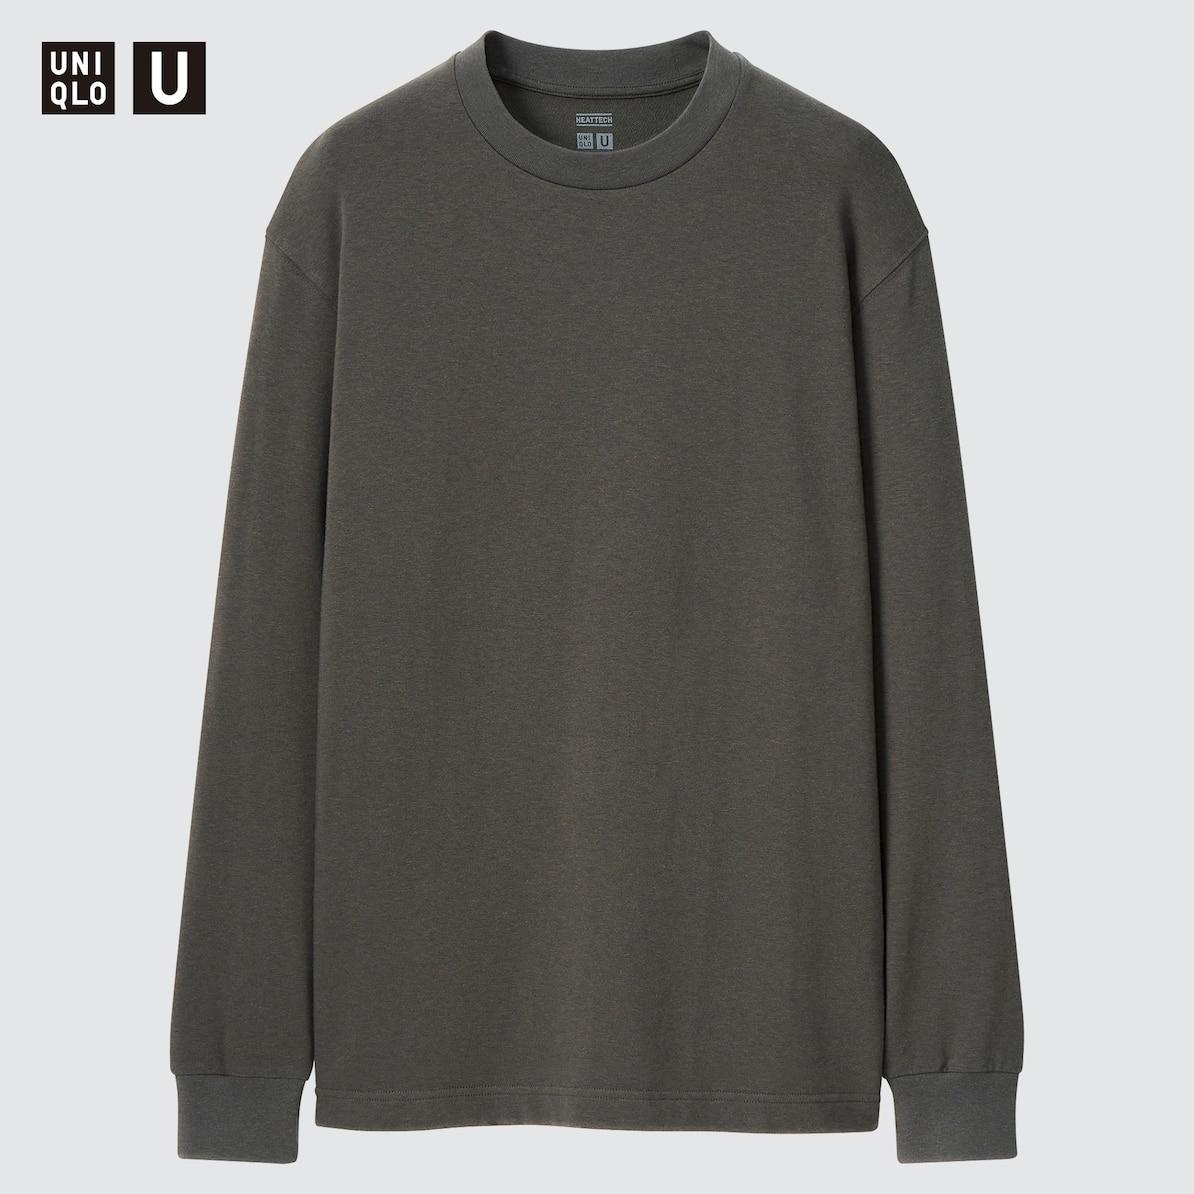 https://image.uniqlo.com/UQ/ST3/AsianCommon/imagesgoods/432513/item/goods_08_432513.jpg?width=1194